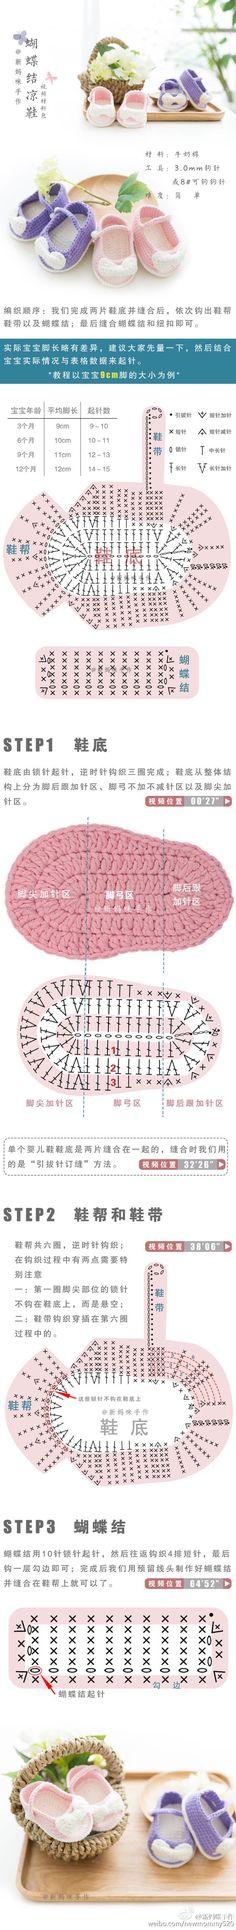 Crochet Cute Shoes - Chart ❥ 4U hilariafina http://www.pinterest.com/hilariafina/